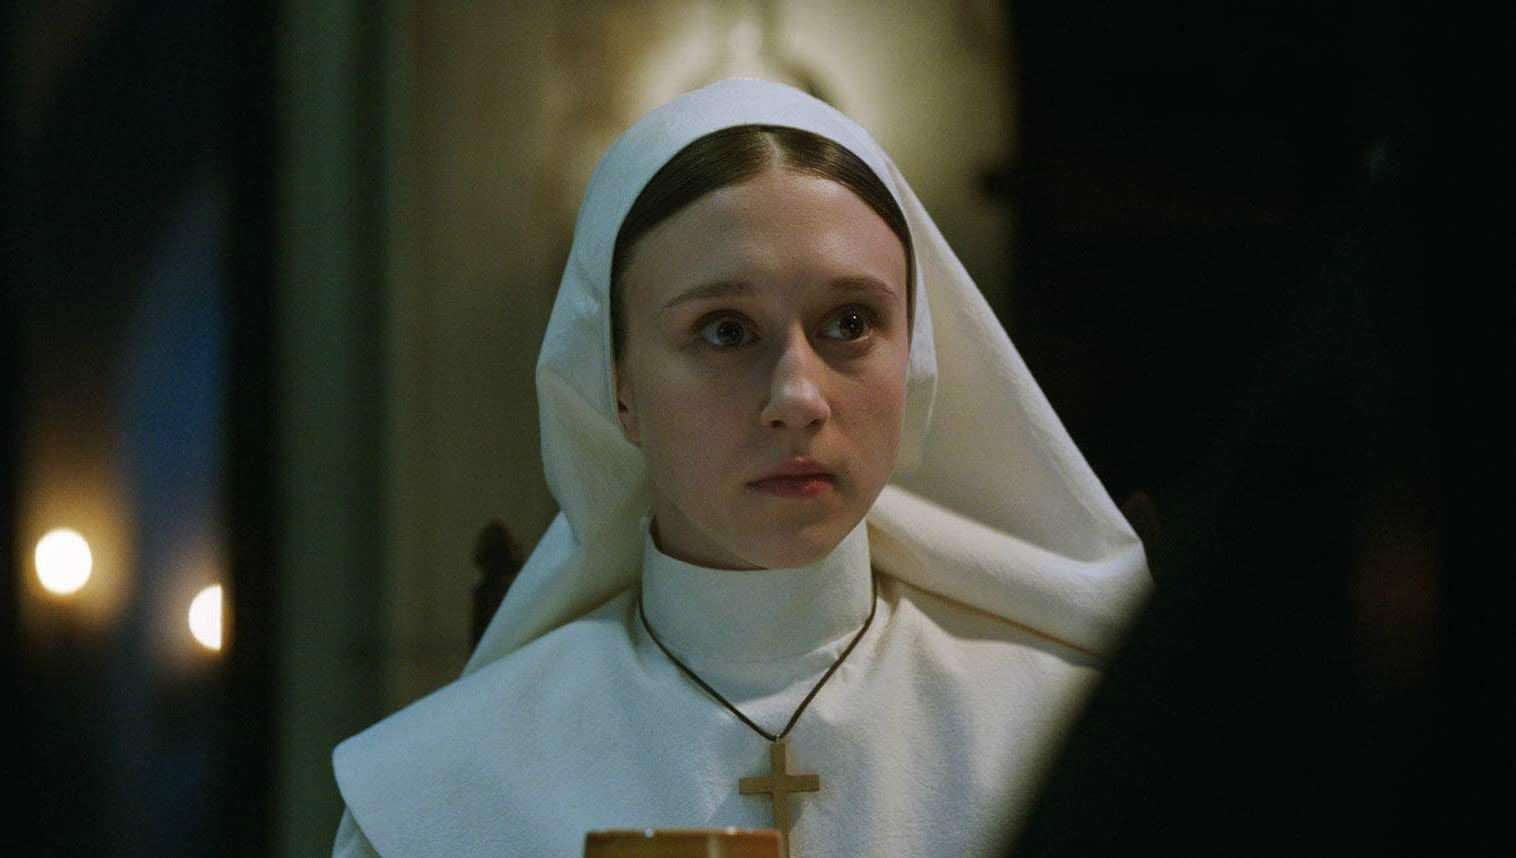 Movie Shopper's Guide - The Nun : 恐怖の尼さんヴァラクのルーツを描いて、「ザ・カンジュアリング」シリーズ史上最大のヒット作になったスピンオフ映画の Blu-ray と DVD のセットが来春2019年2月6日に発売!!